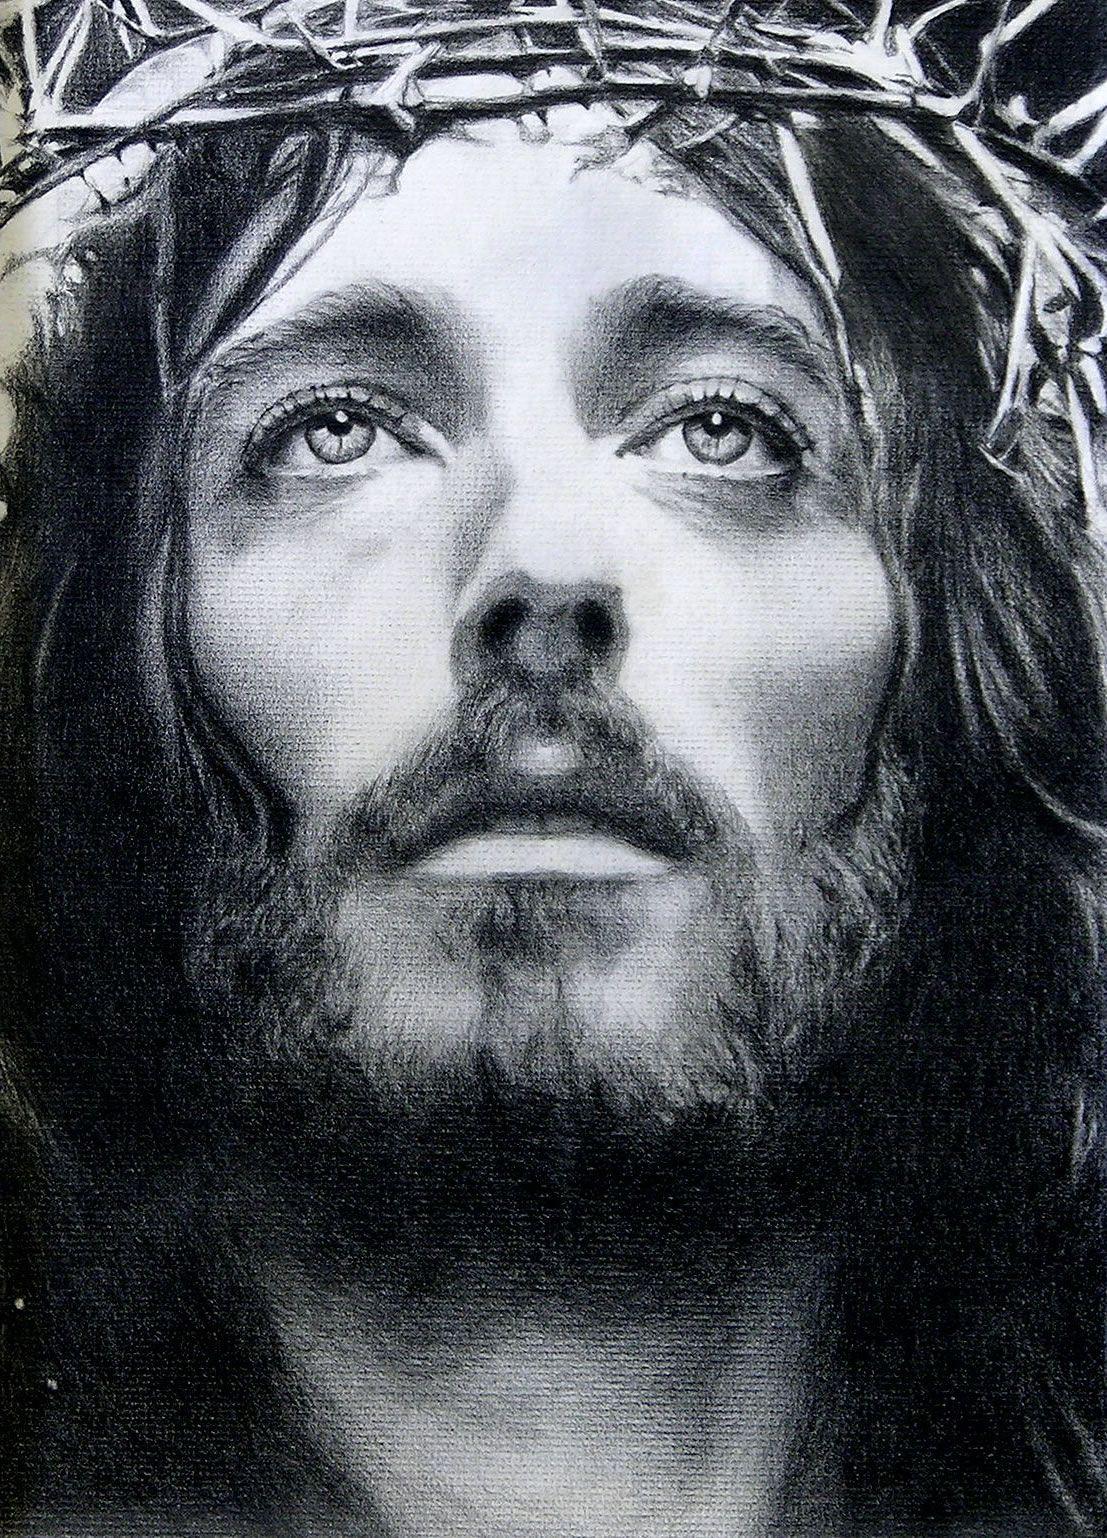 Jesus Y Corona De Espinas Jesuschrist Pinterest Jesus Drawings